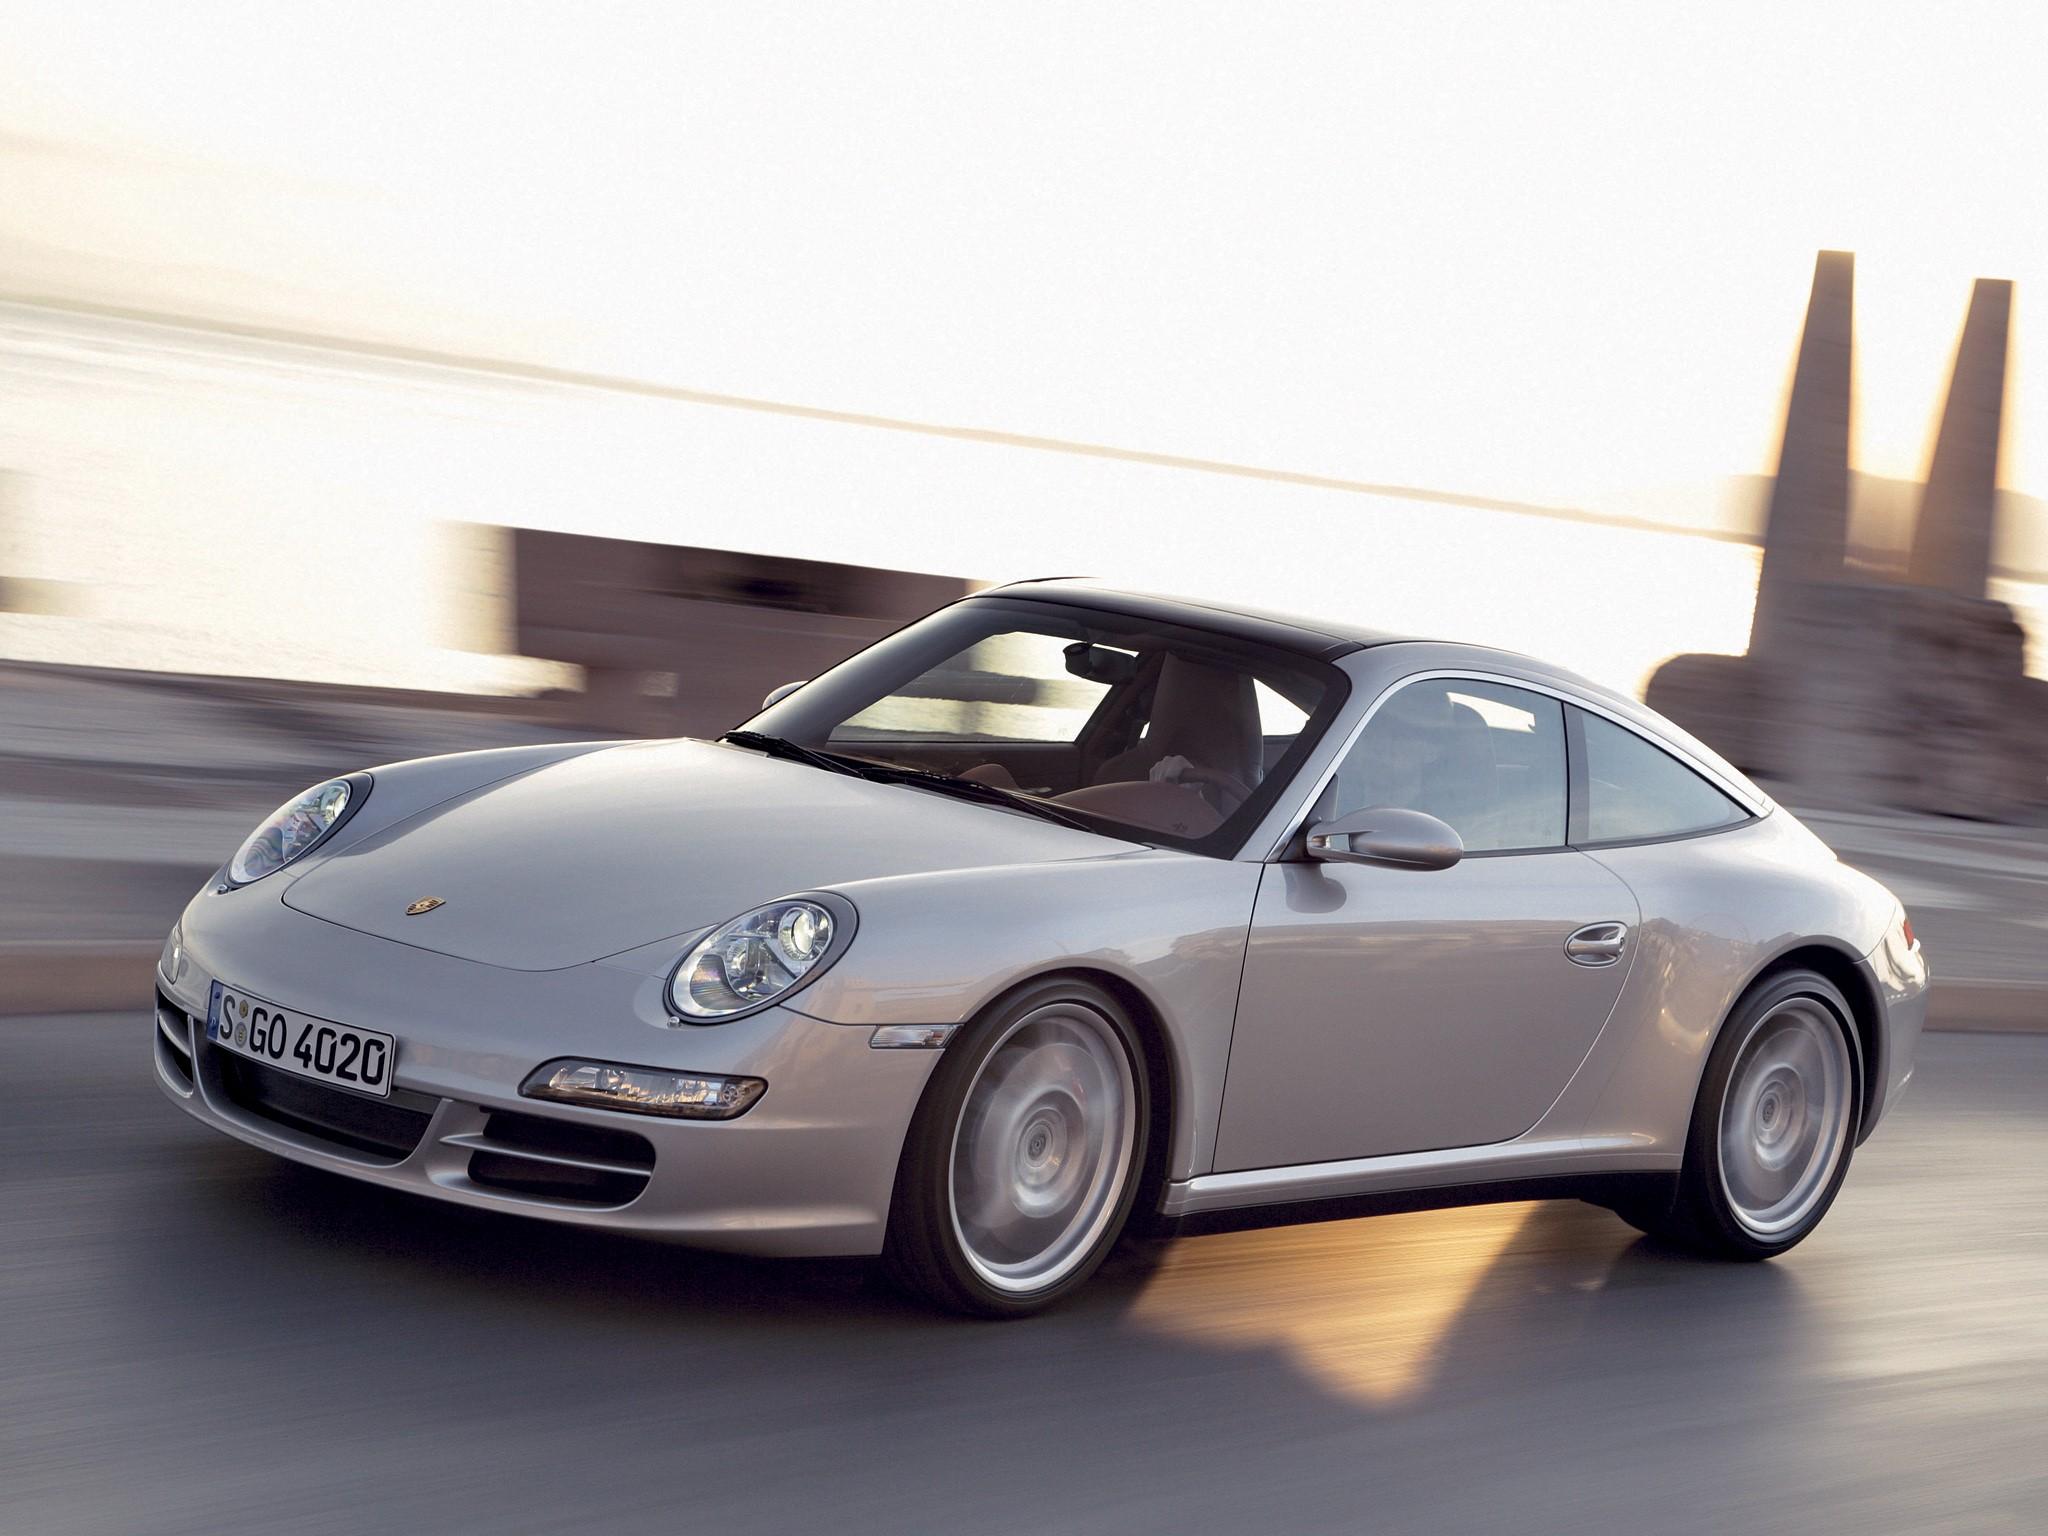 911 Targa 4S >> PORSCHE 911 Carrera Targa 4S (997) specs & photos - 2006, 2007, 2008 - autoevolution